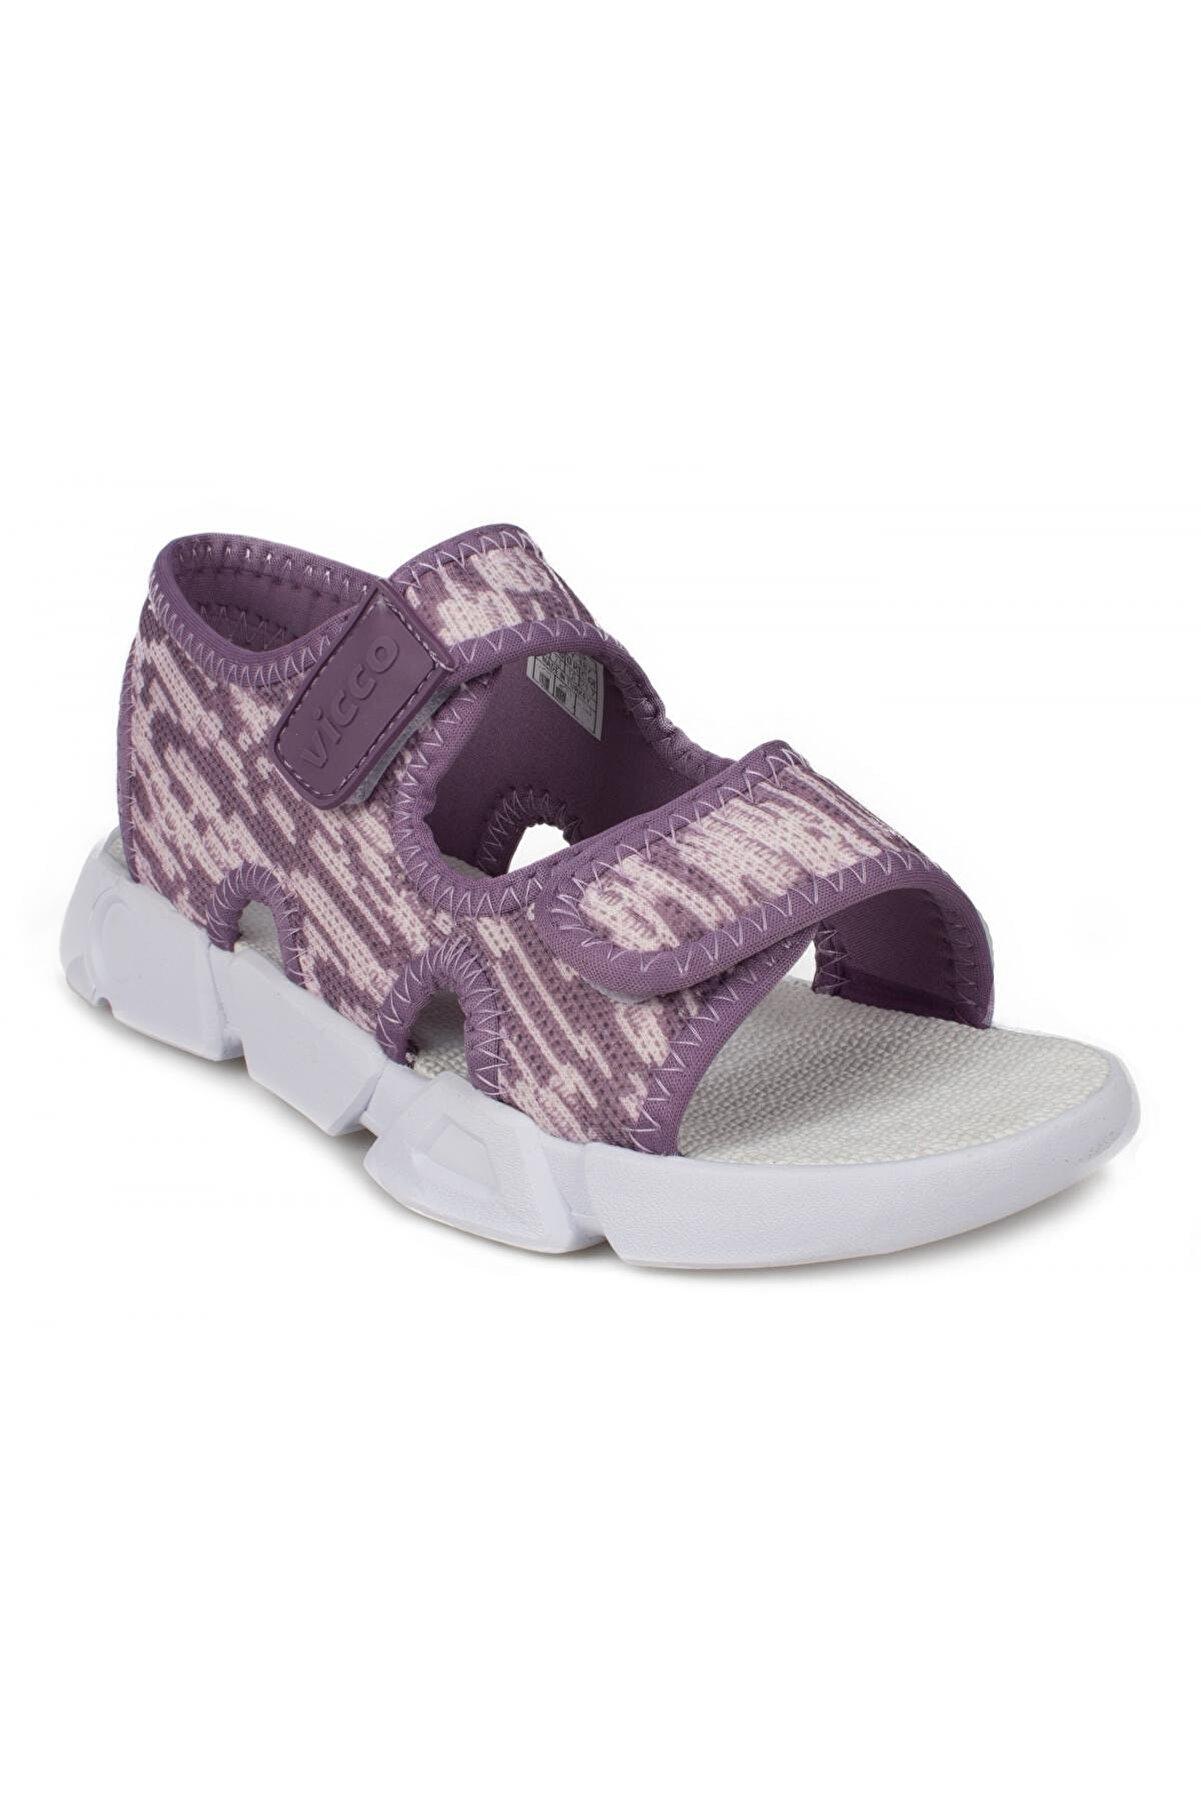 Vicco Çocuk Sandalet